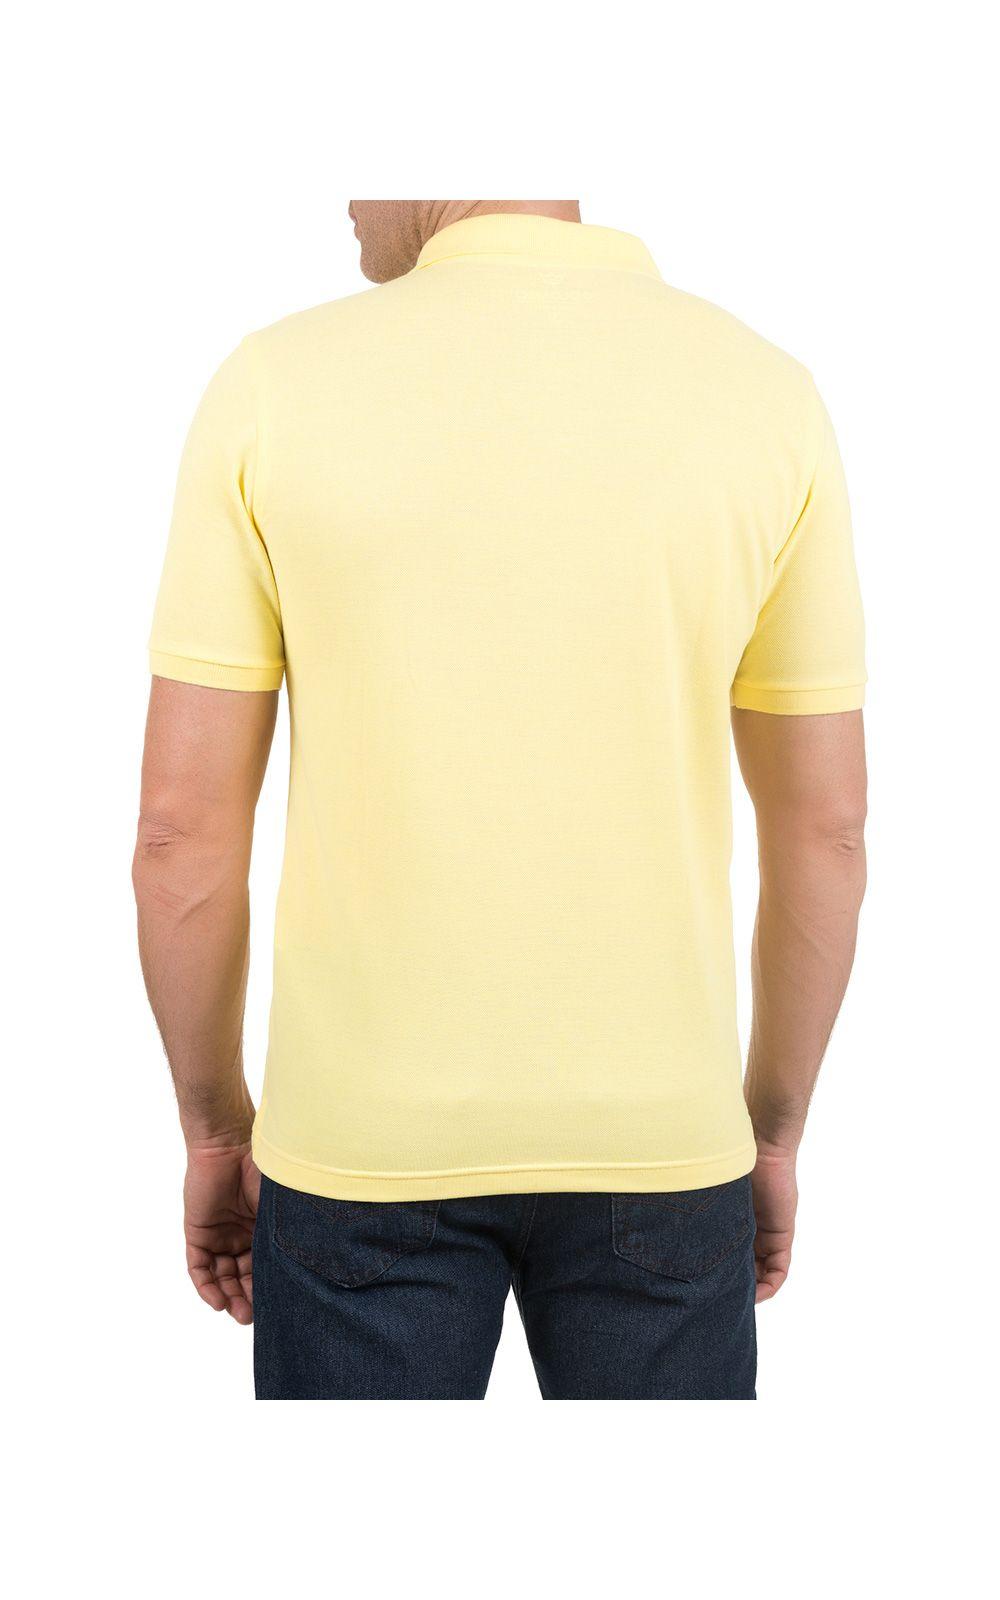 Foto 2 - Camisa Polo Masculina Amarela Lisa